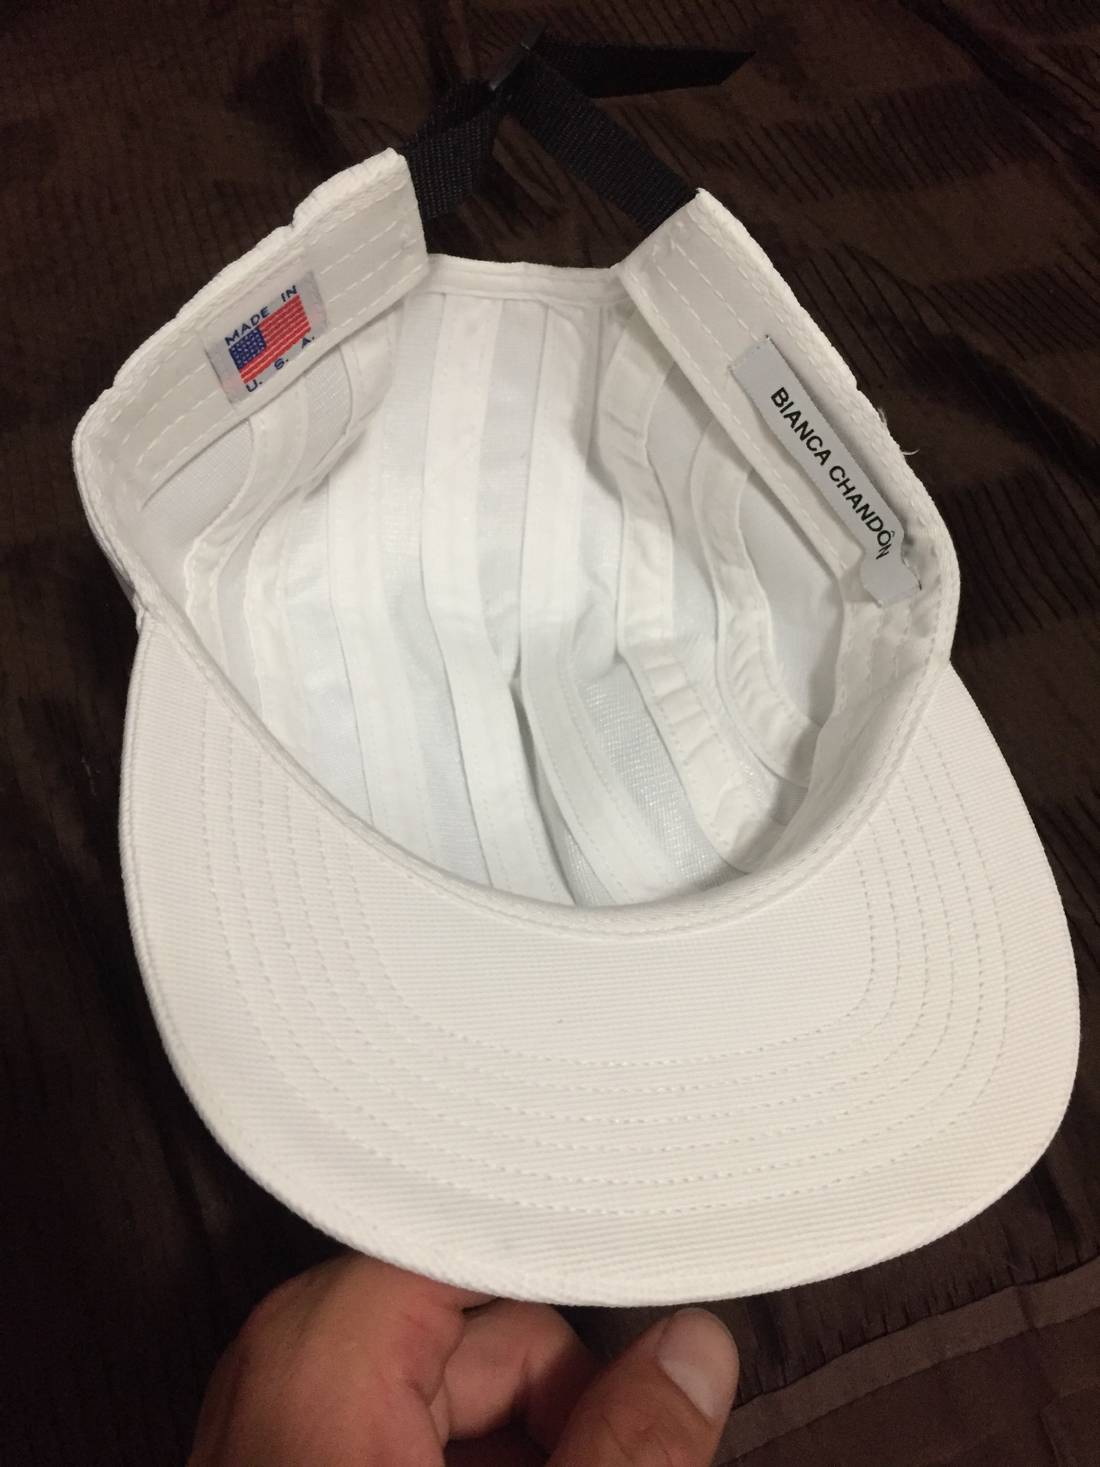 ... Bianca Chandon 8-PANEL LOGOTYPE HAT Size ONE SIZE - 2